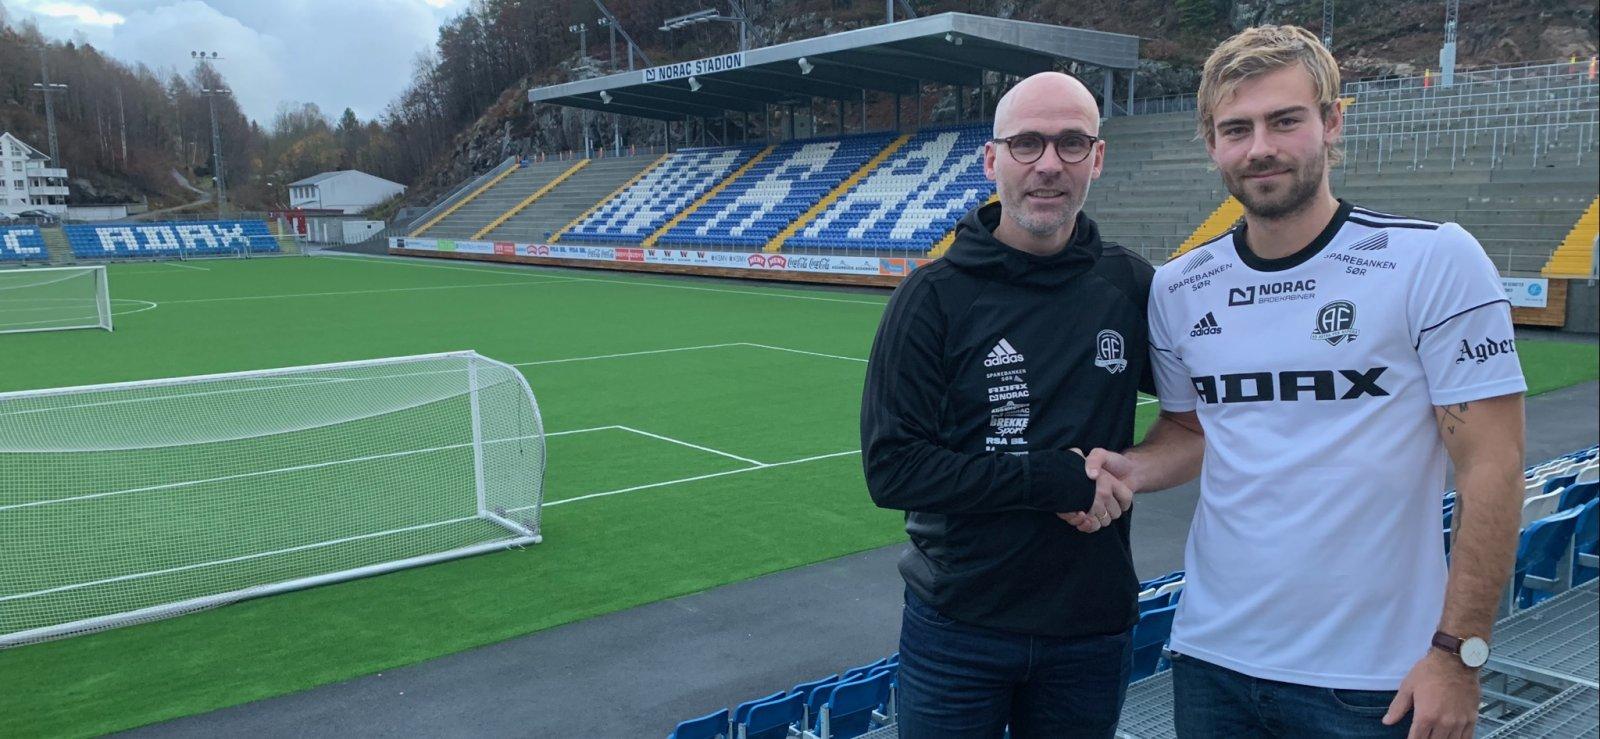 Steinar Pedersen ønsker Mads Nørby Madsen velkommen til Norac stadion.